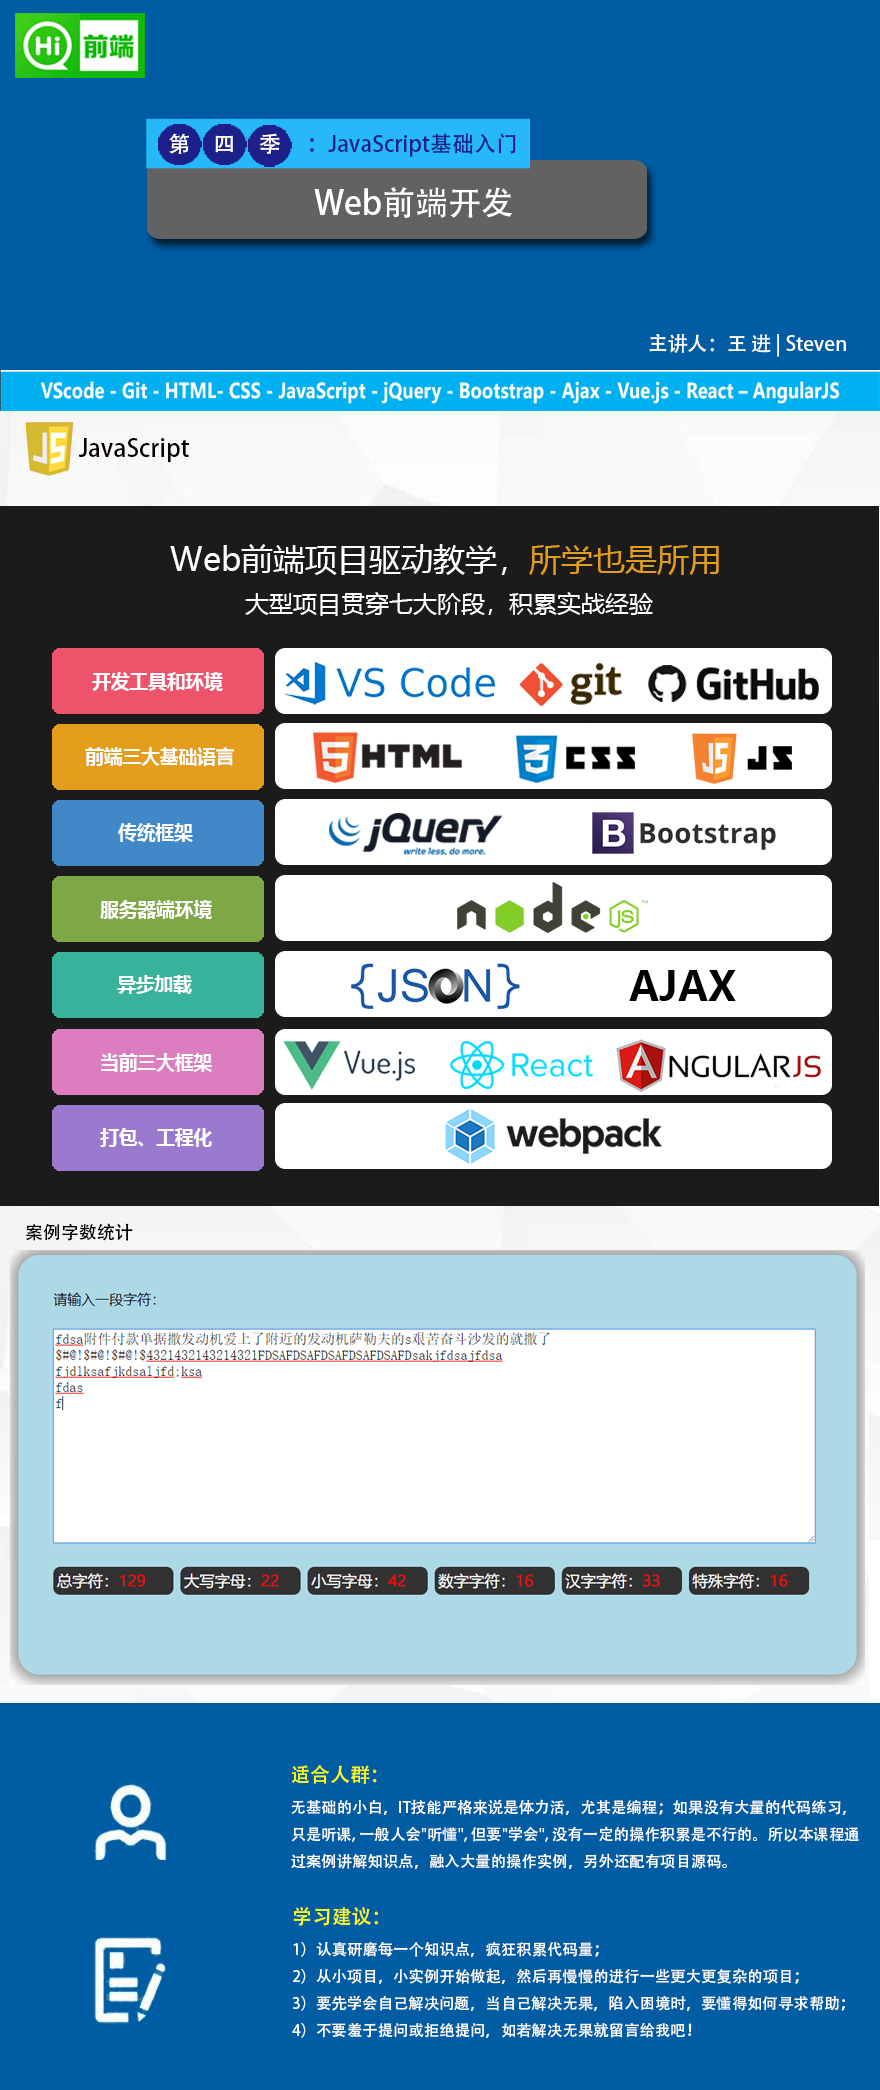 web开发课程介绍.png